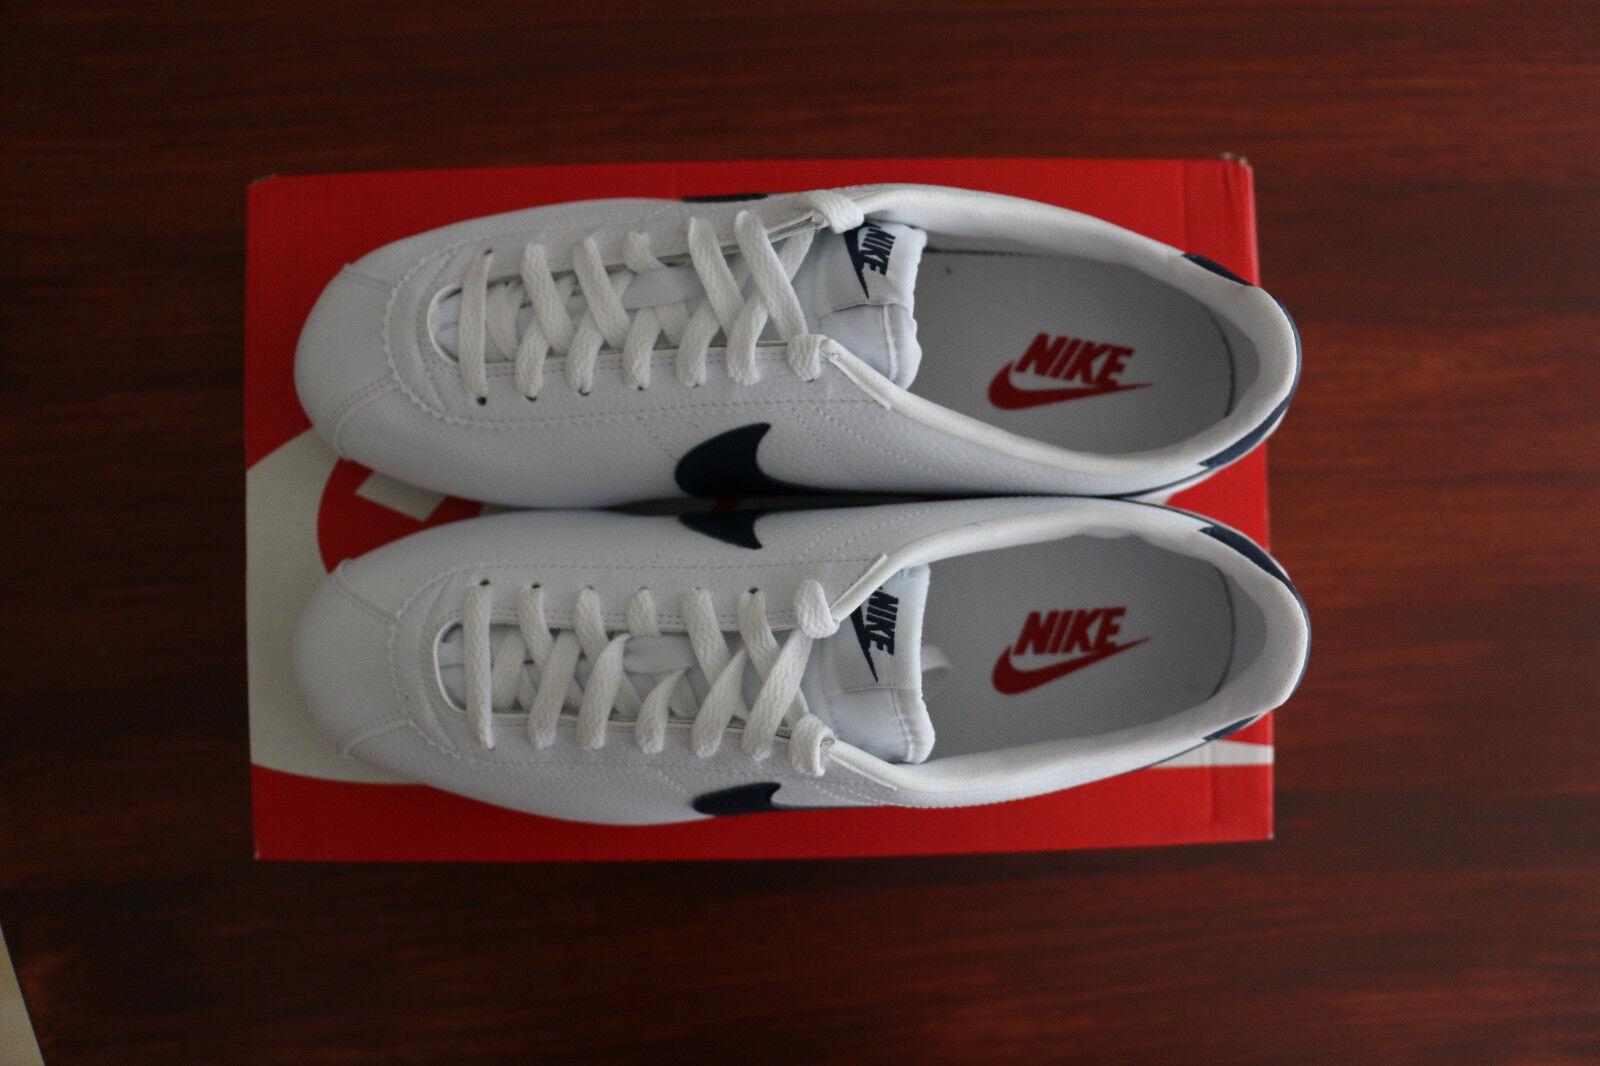 Nike Cortez Classic Leder Weiß/Midnight Navy/Gym ROT